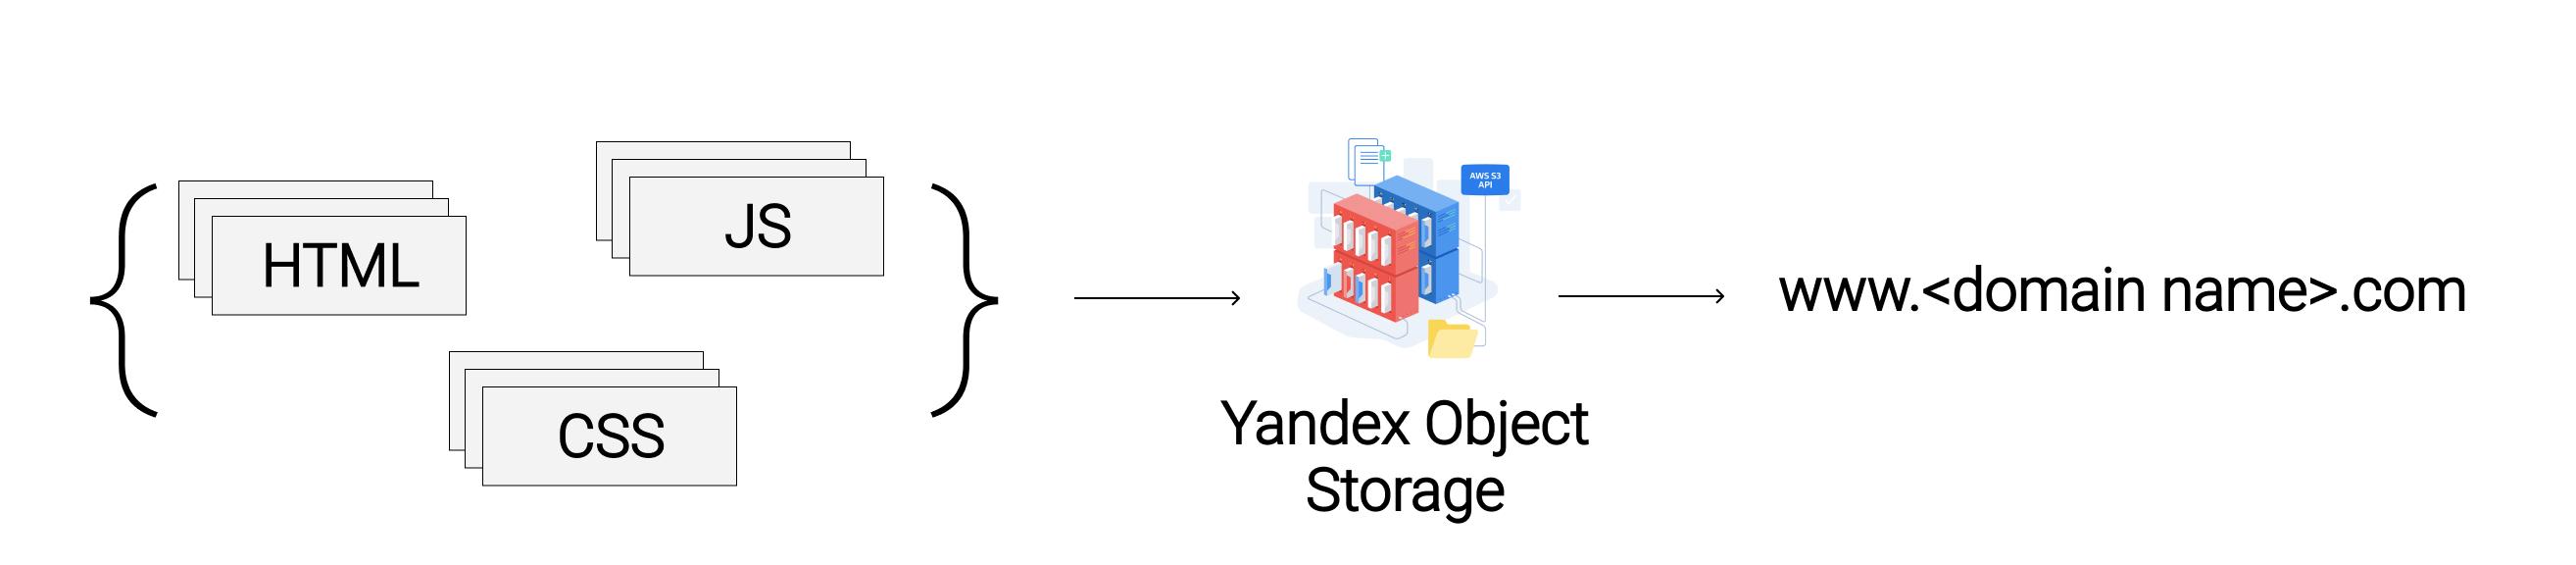 Архитектура фронтенда на Яндекс.Облаке